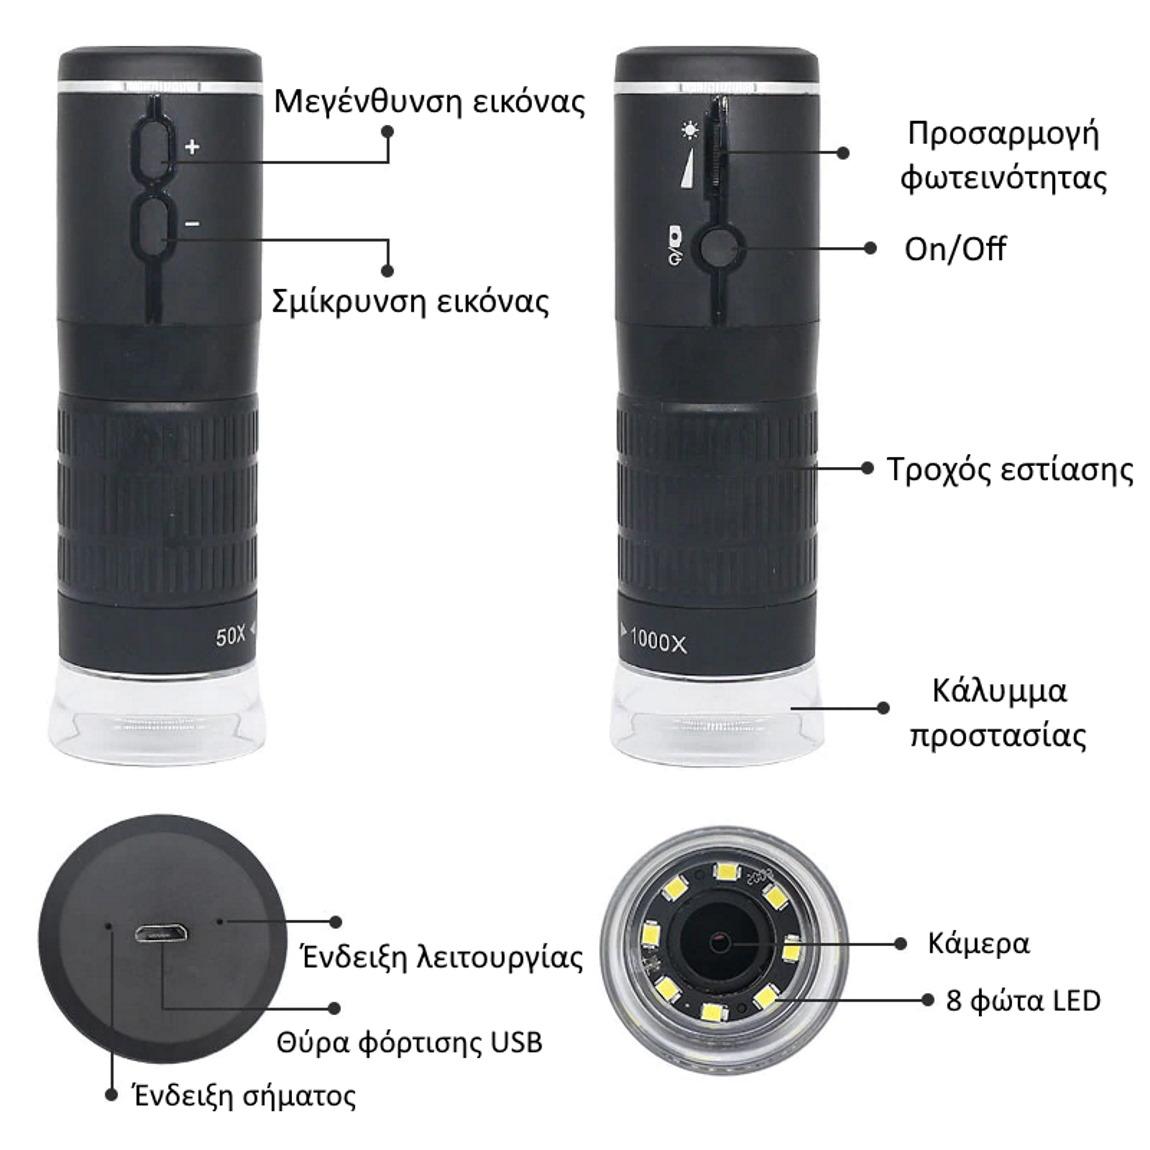 Eccomum μικροσκόπιο usb